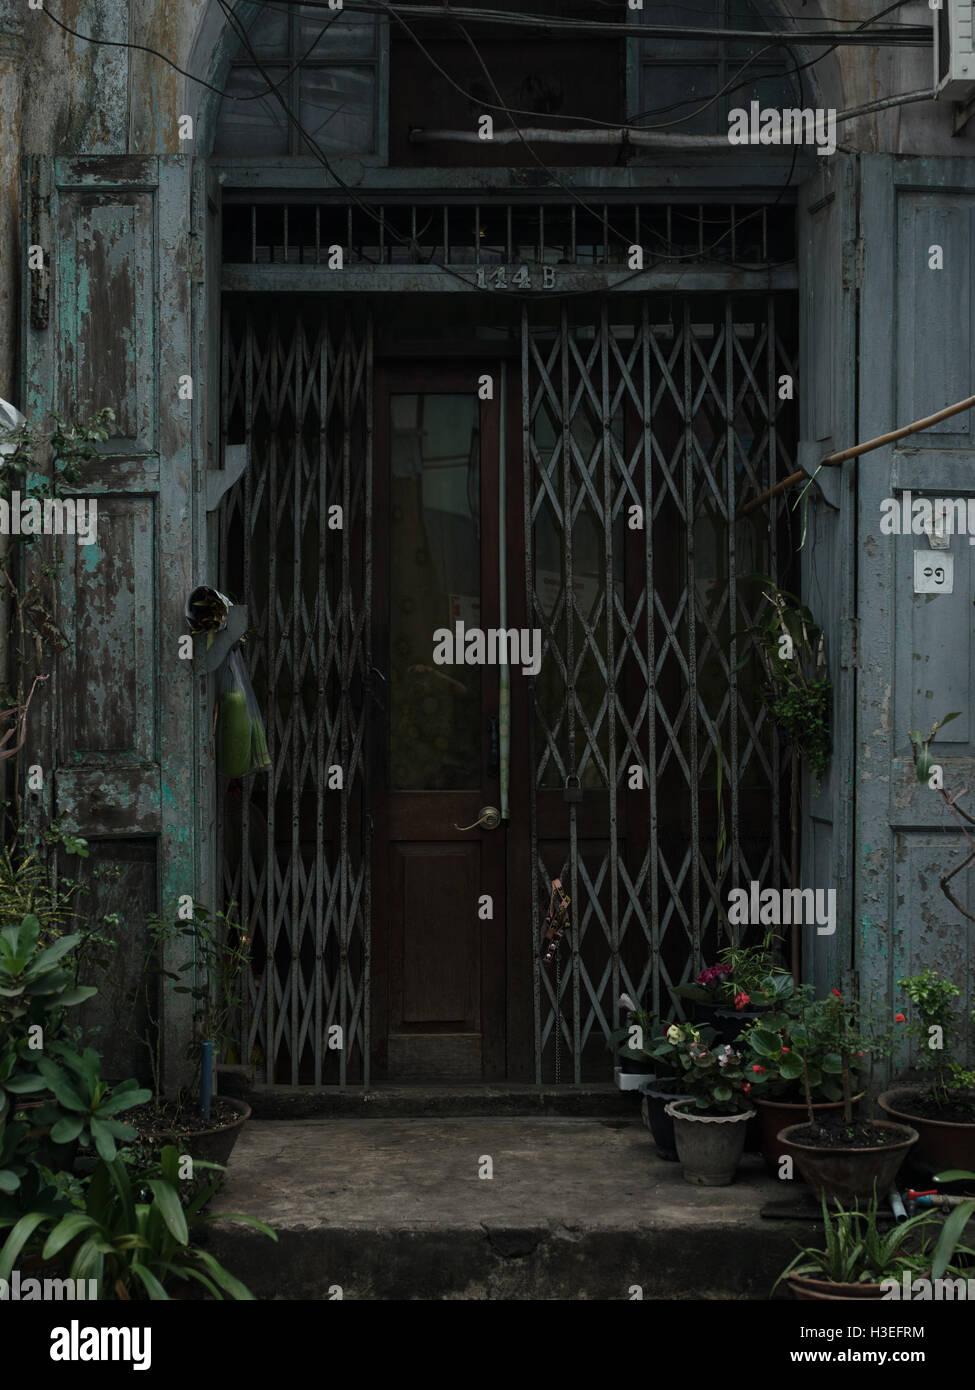 Doorway in Yangon, Myanmar (Burma) - Stock Image